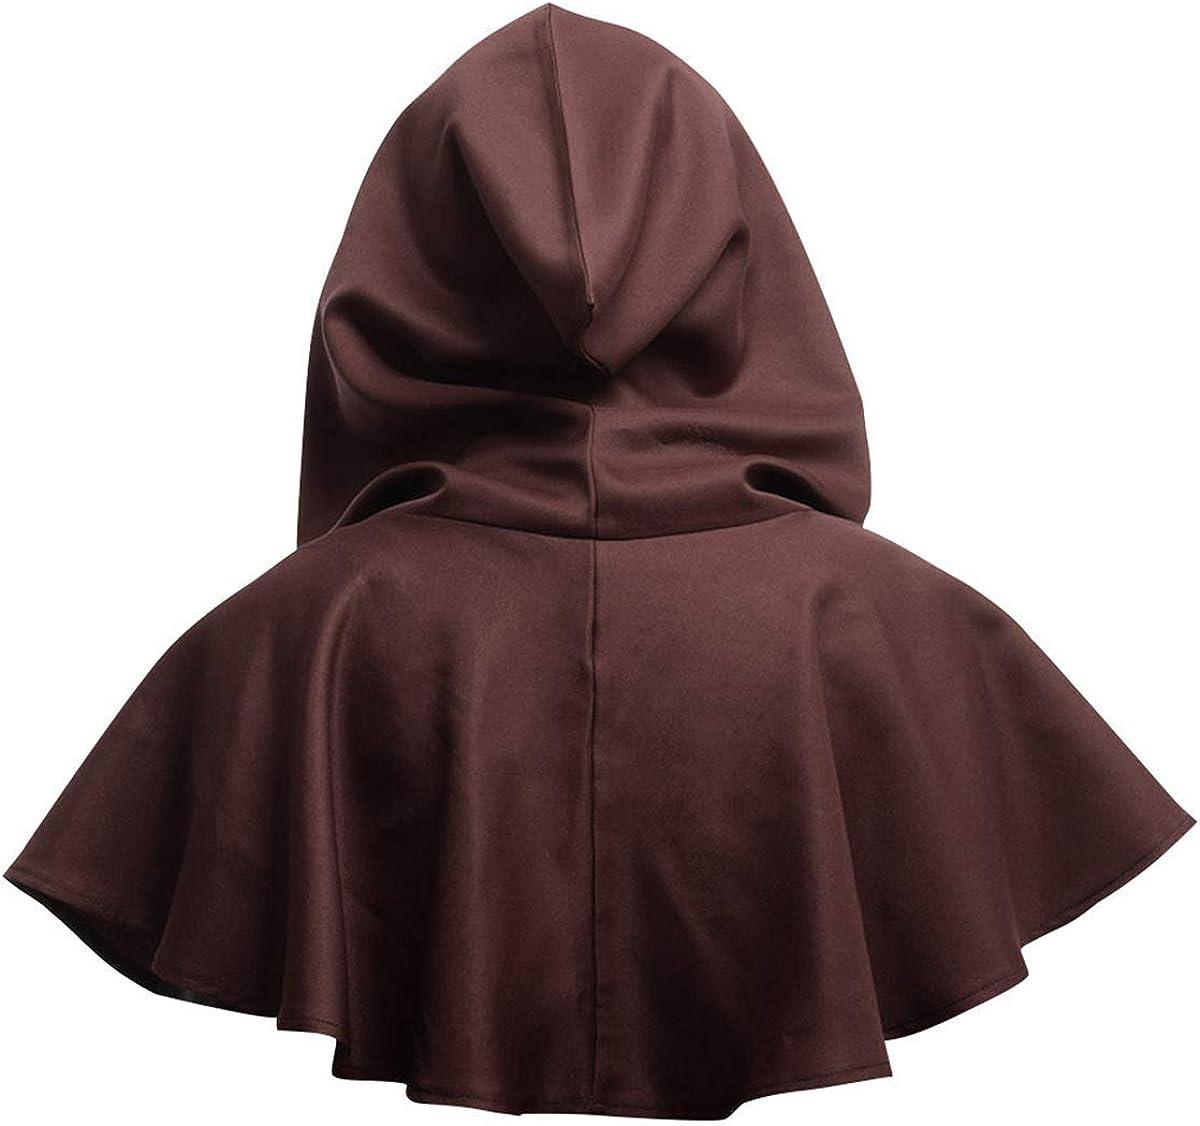 Tianhaik Halloween Grim Cowl Cloak Cosplay Costumes Hooded Poncho for Men Women